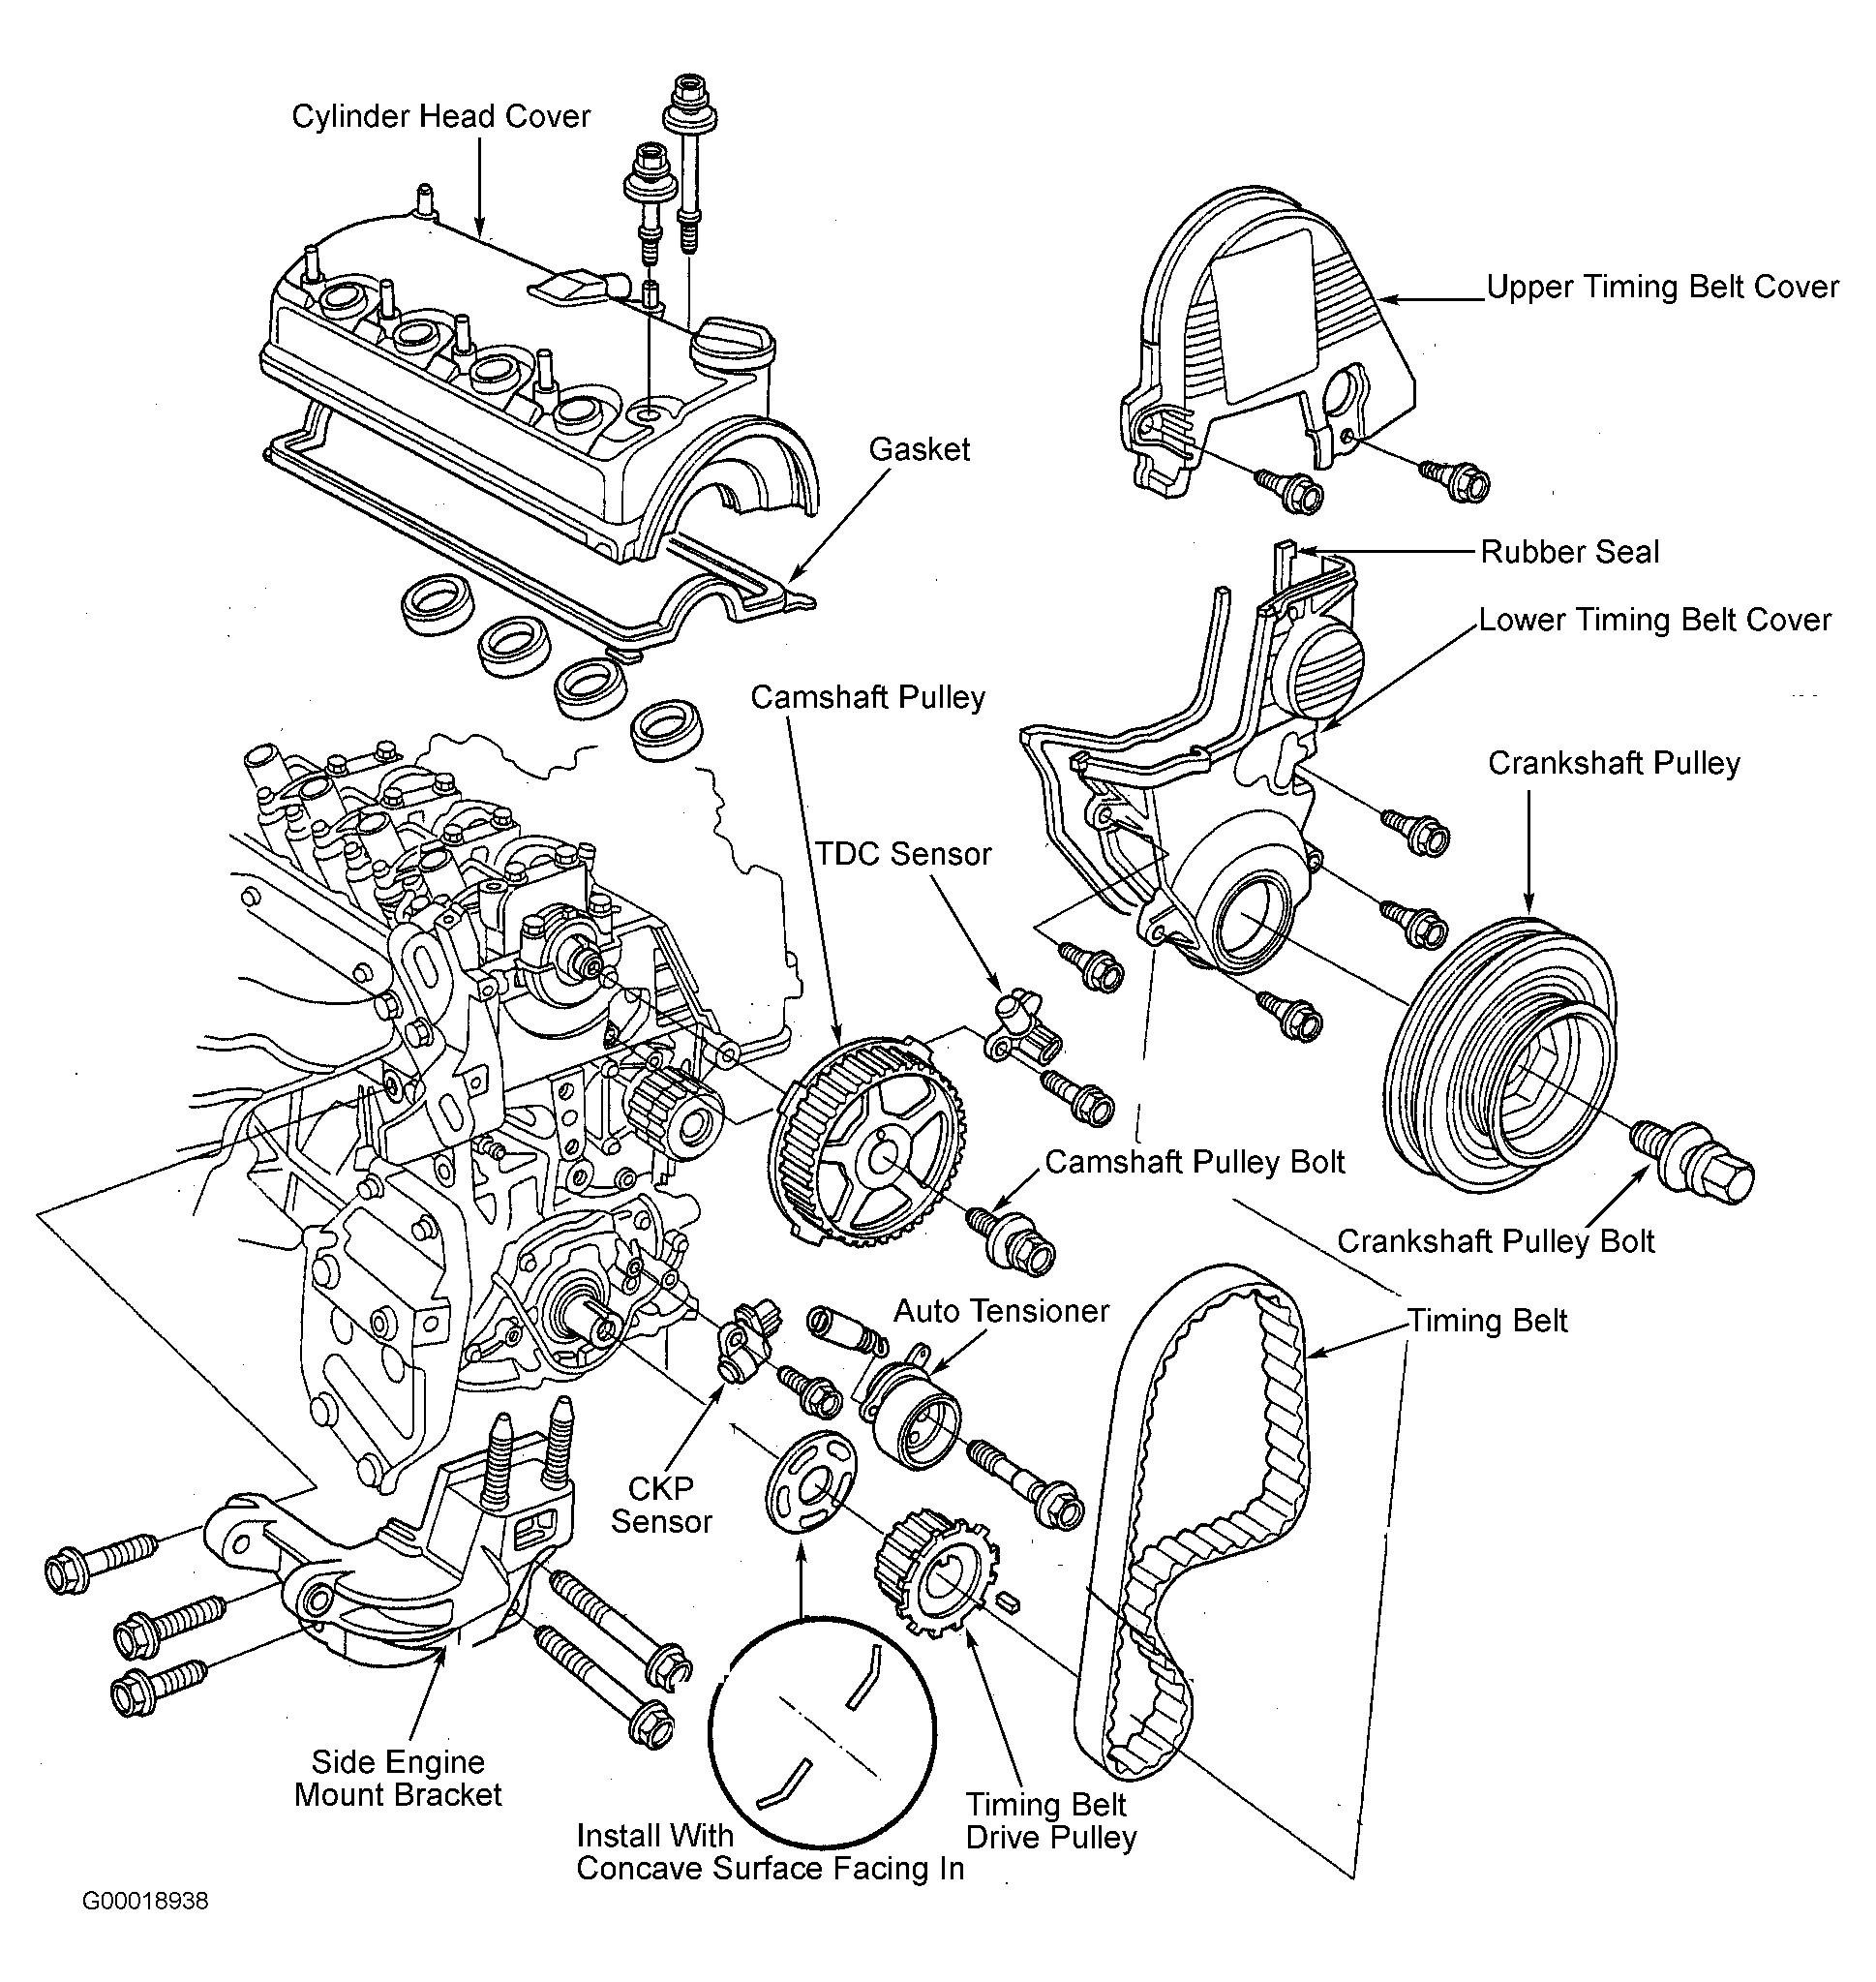 2001 Honda Civic Ex Engine Diagram Download 2003 Honda Civic Parts Of 2001 Honda Civic Ex Engine Diagram